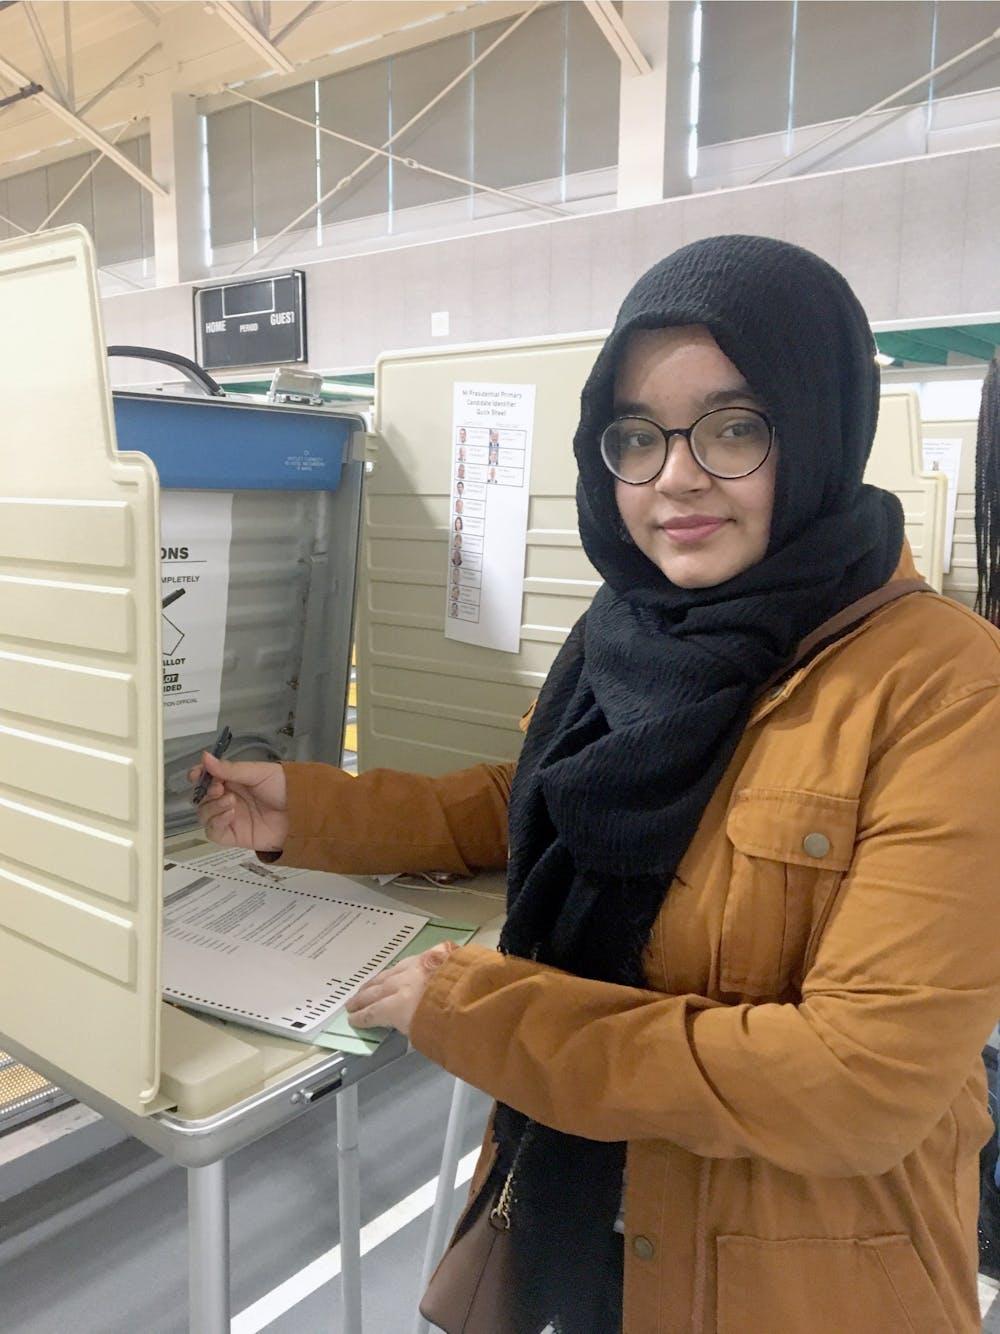 <p>Senior Sadia Rahman casts her vote. Photo by Naja Johnson.</p>